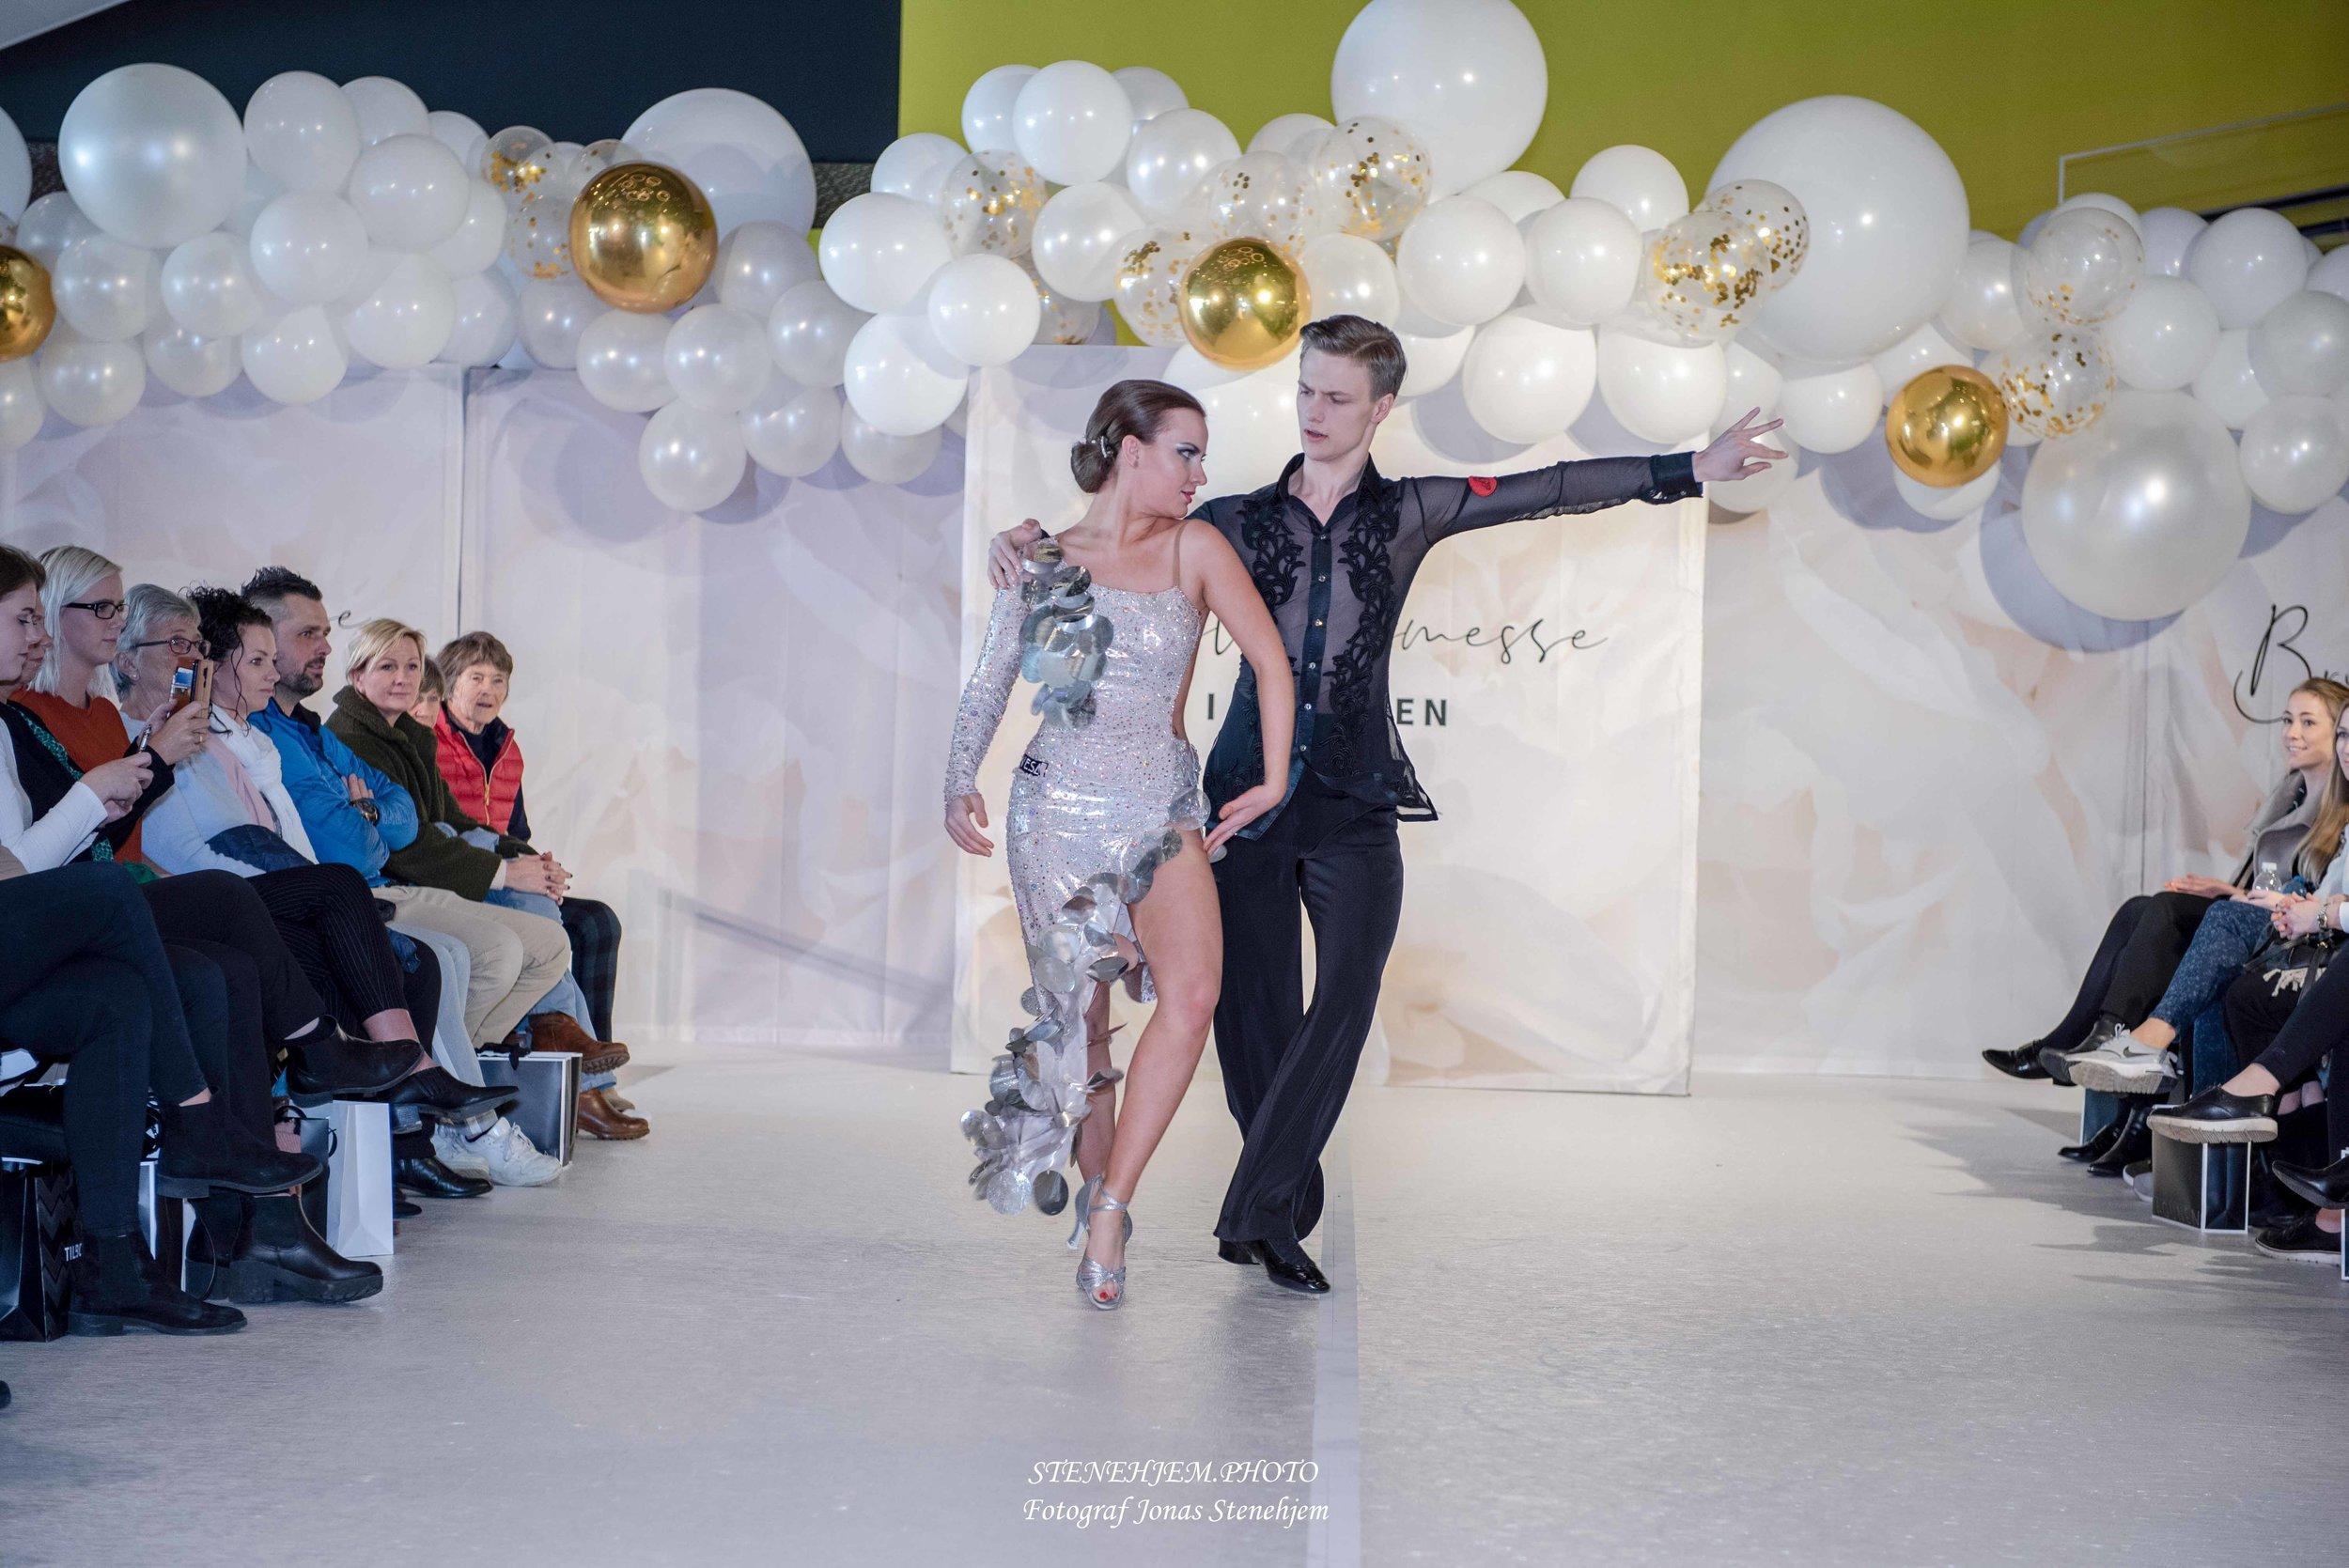 Bryllupsmesse_Lagunen_mittaltweddingfair__056.jpg